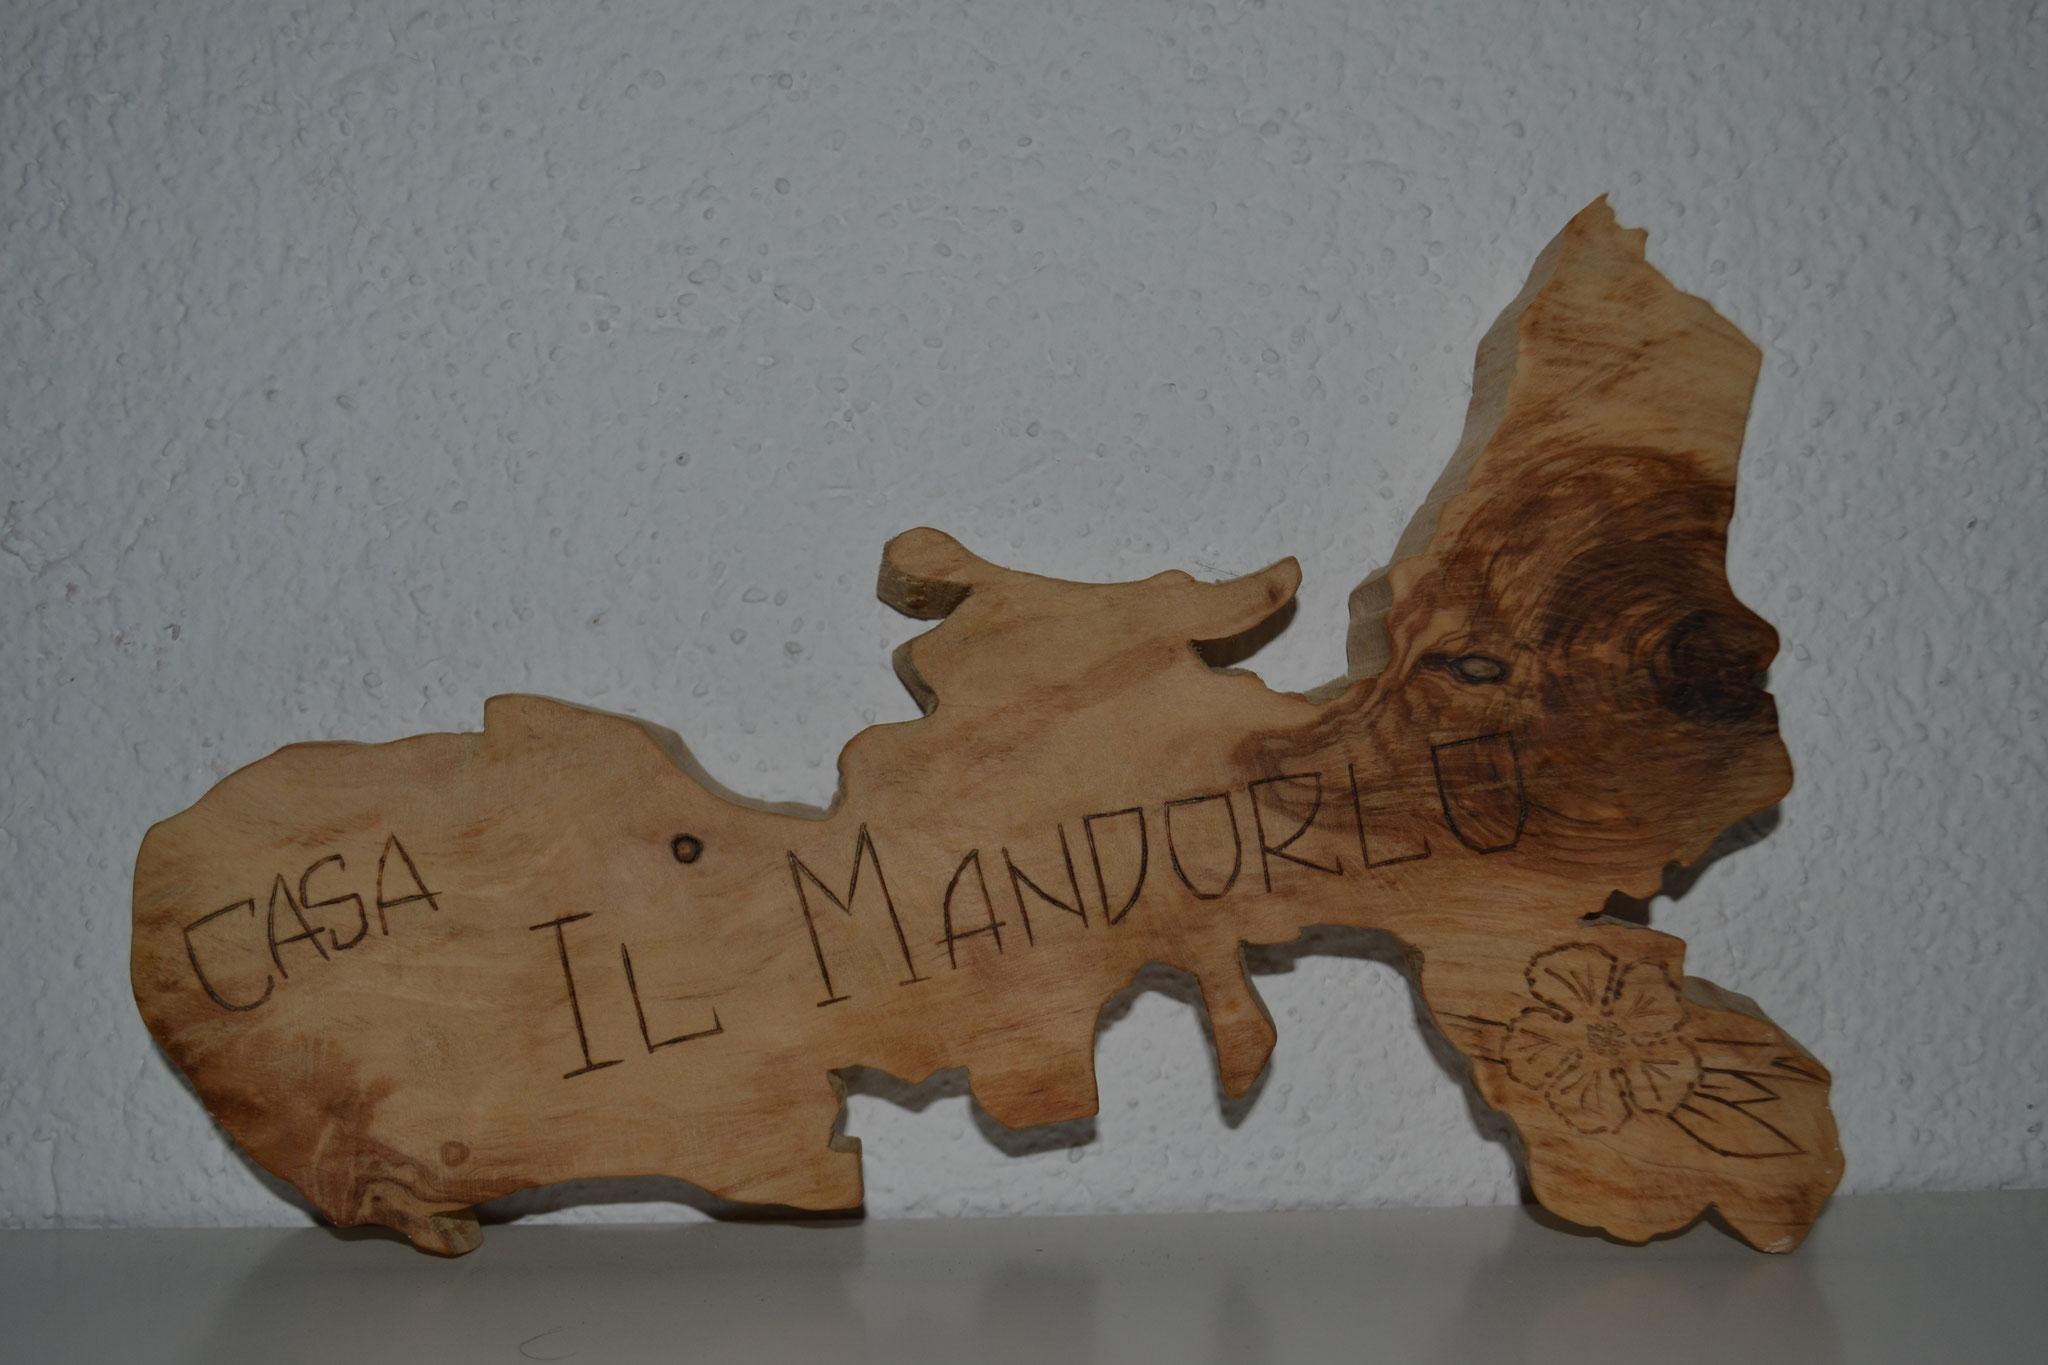 Casa Vacanza Il Mandorlo